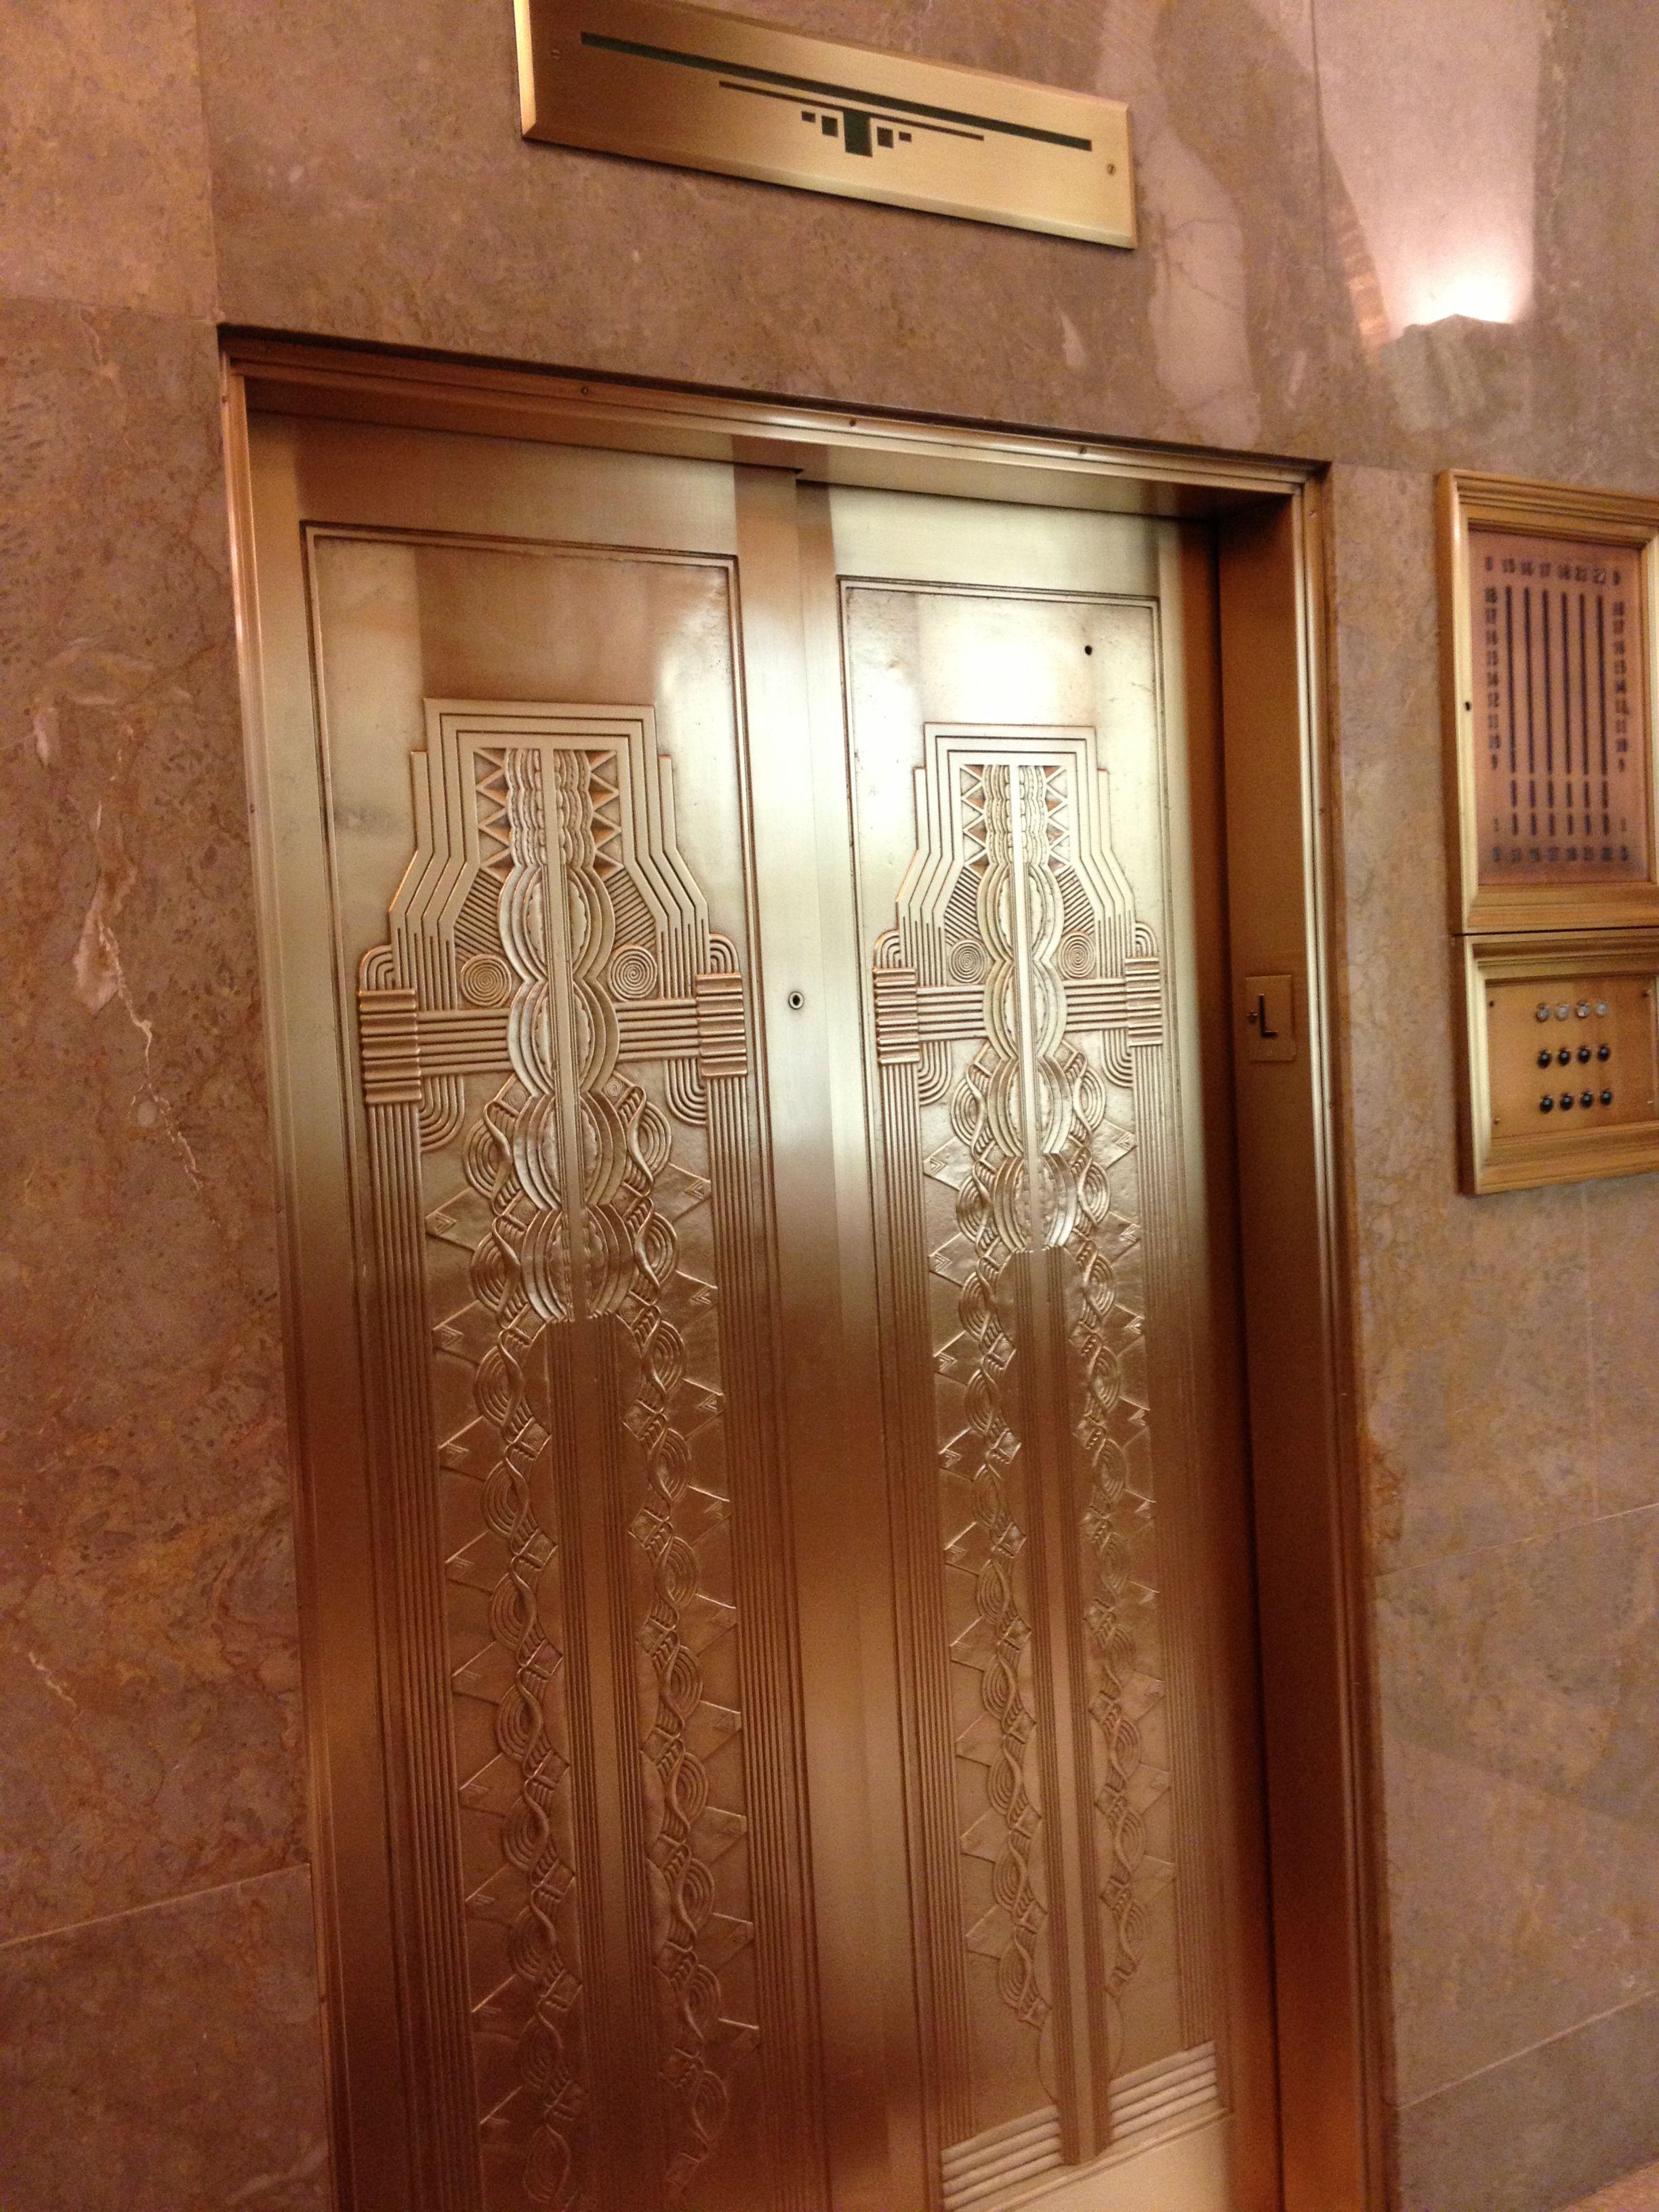 Art deco polished brass elevator doors park avenue new york city